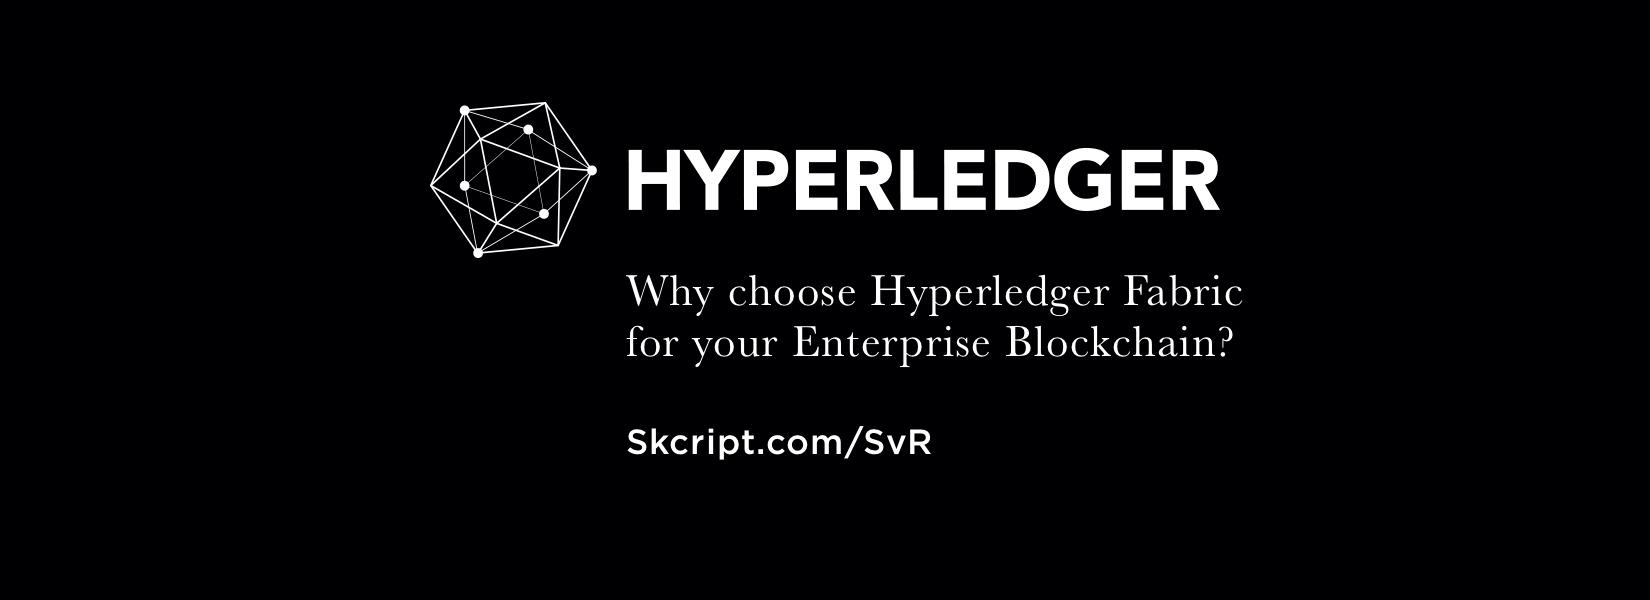 5 advantages of using Hyperledger Fabric for your Enterprise Blockchain